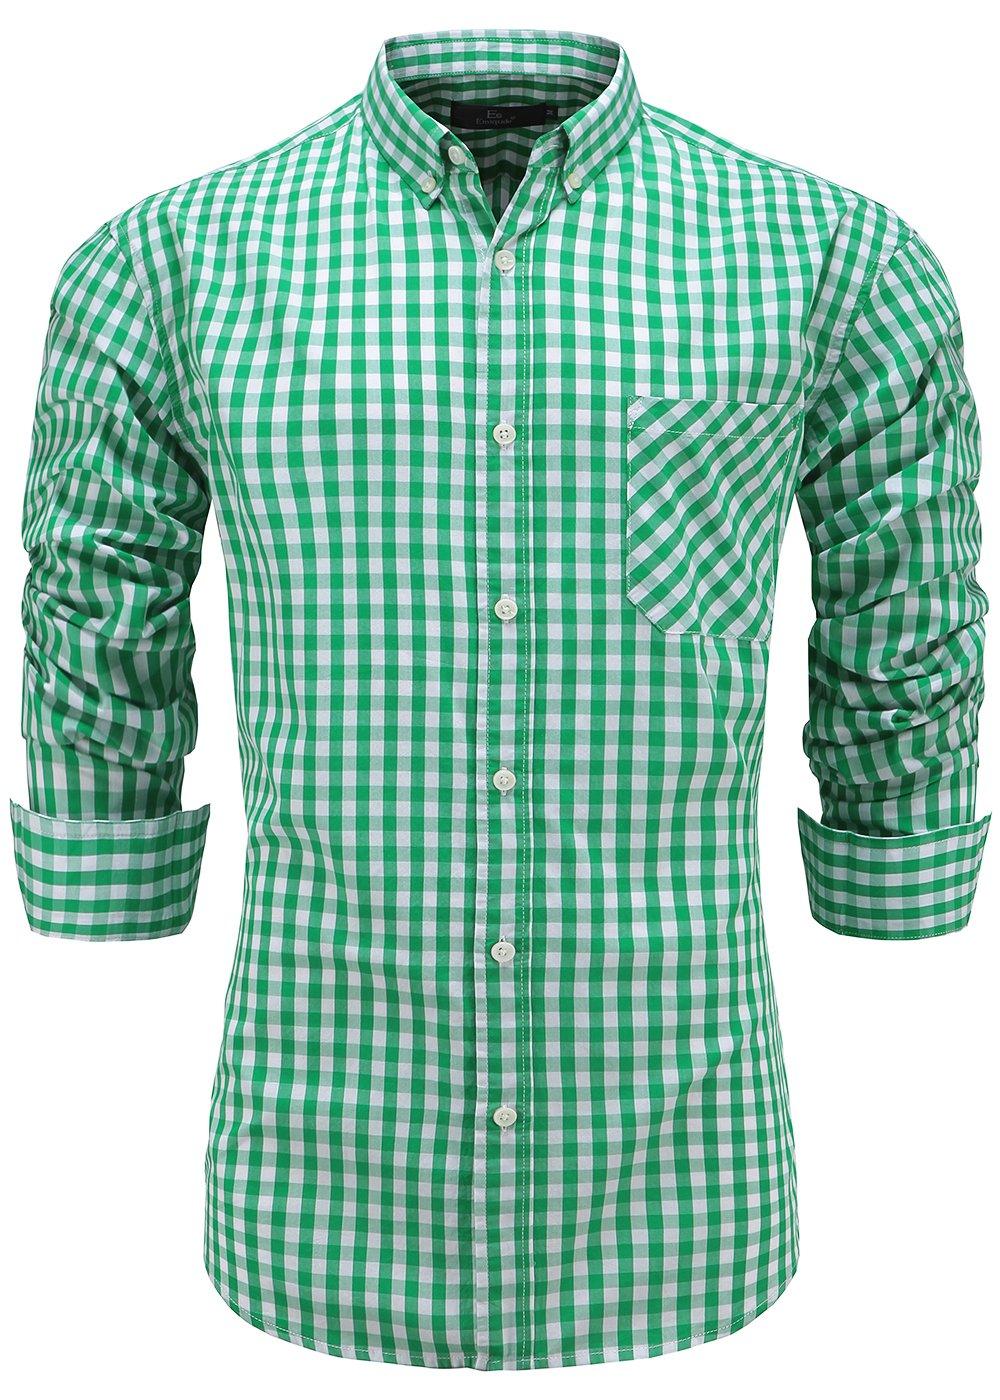 Emiqude Men's 100% Cotton Regular Fit Long Sleeve Button Down Plaid Dress Shirt Large Green